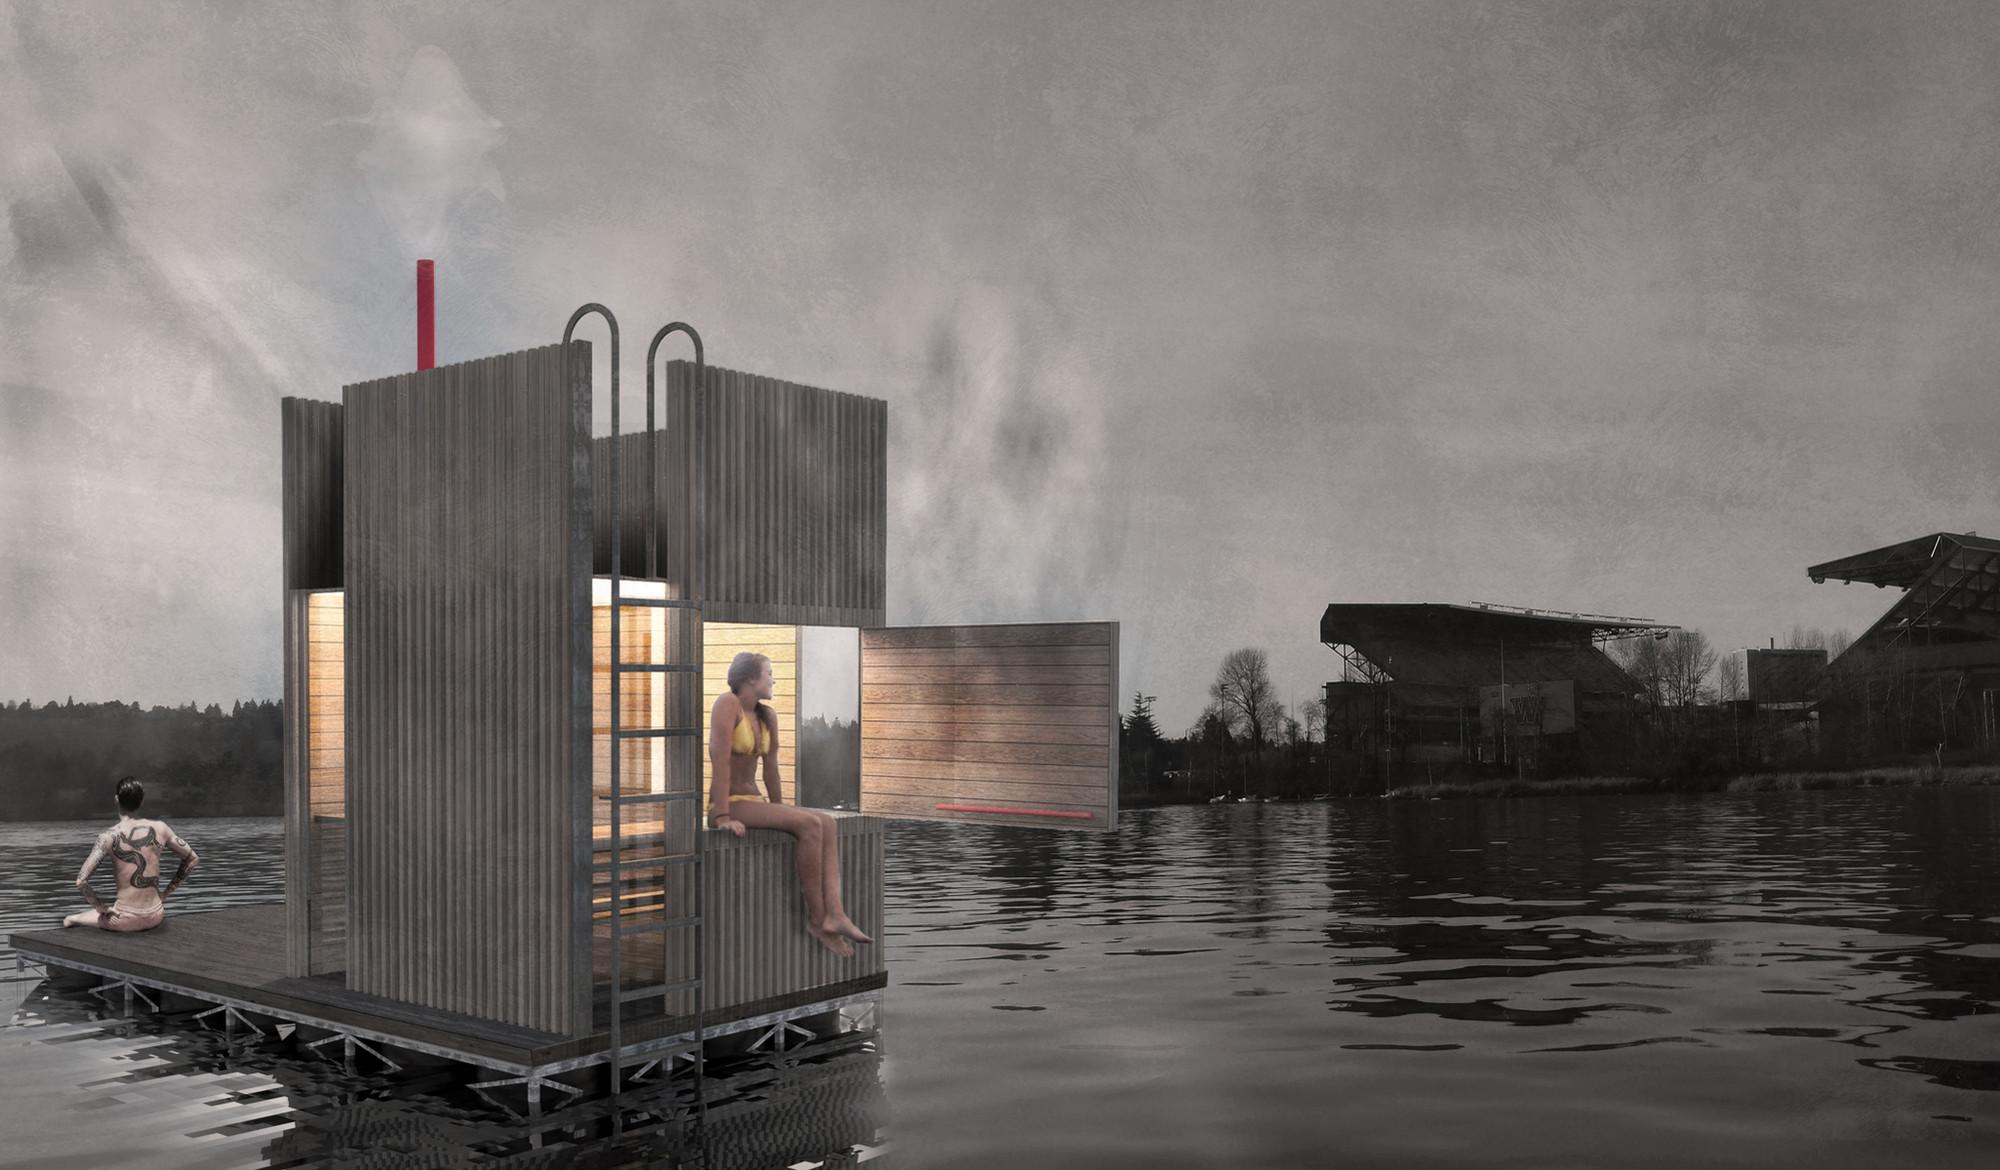 goCstudio Launches New Kickstarter to Fund Floating Sauna in Seattle, open hatch. Image Courtesy of goCstudio